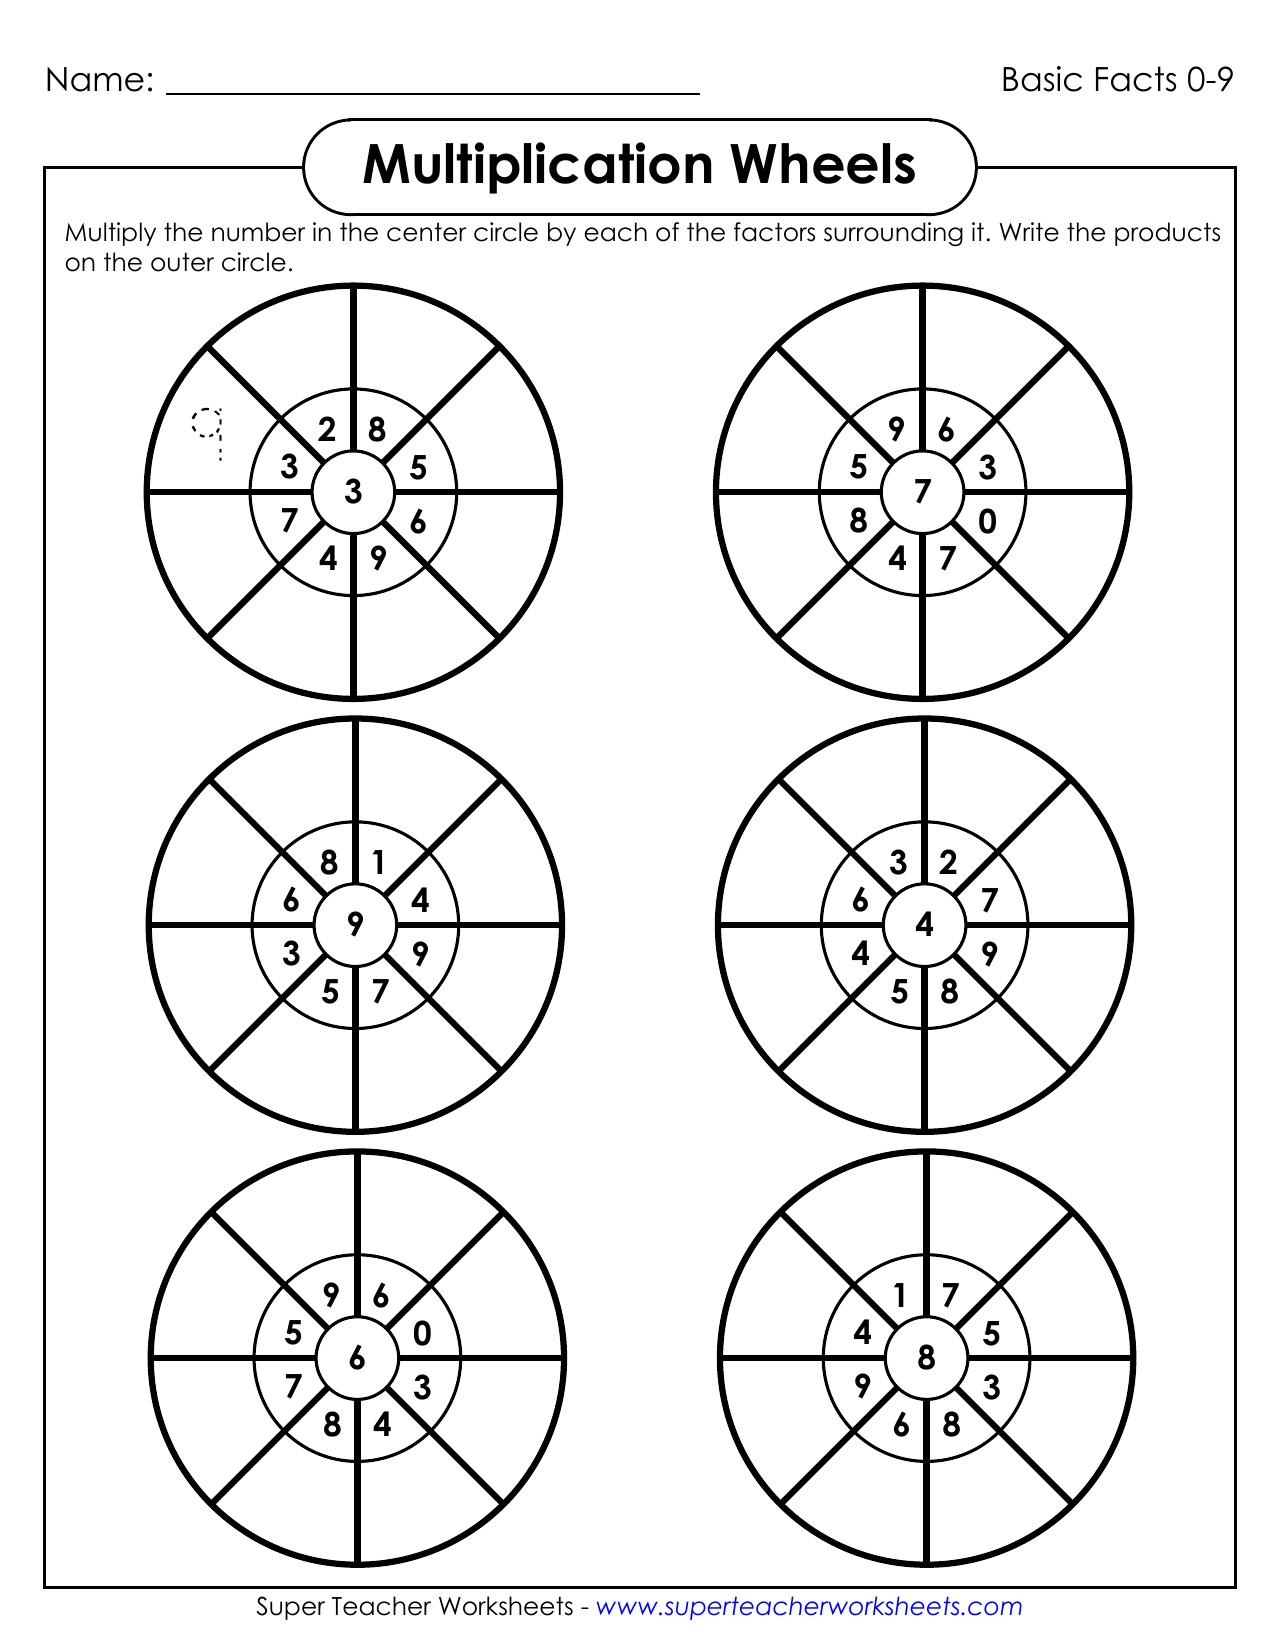 Multiplication Wheels - Super Teacher Worksheets | manualzz.com